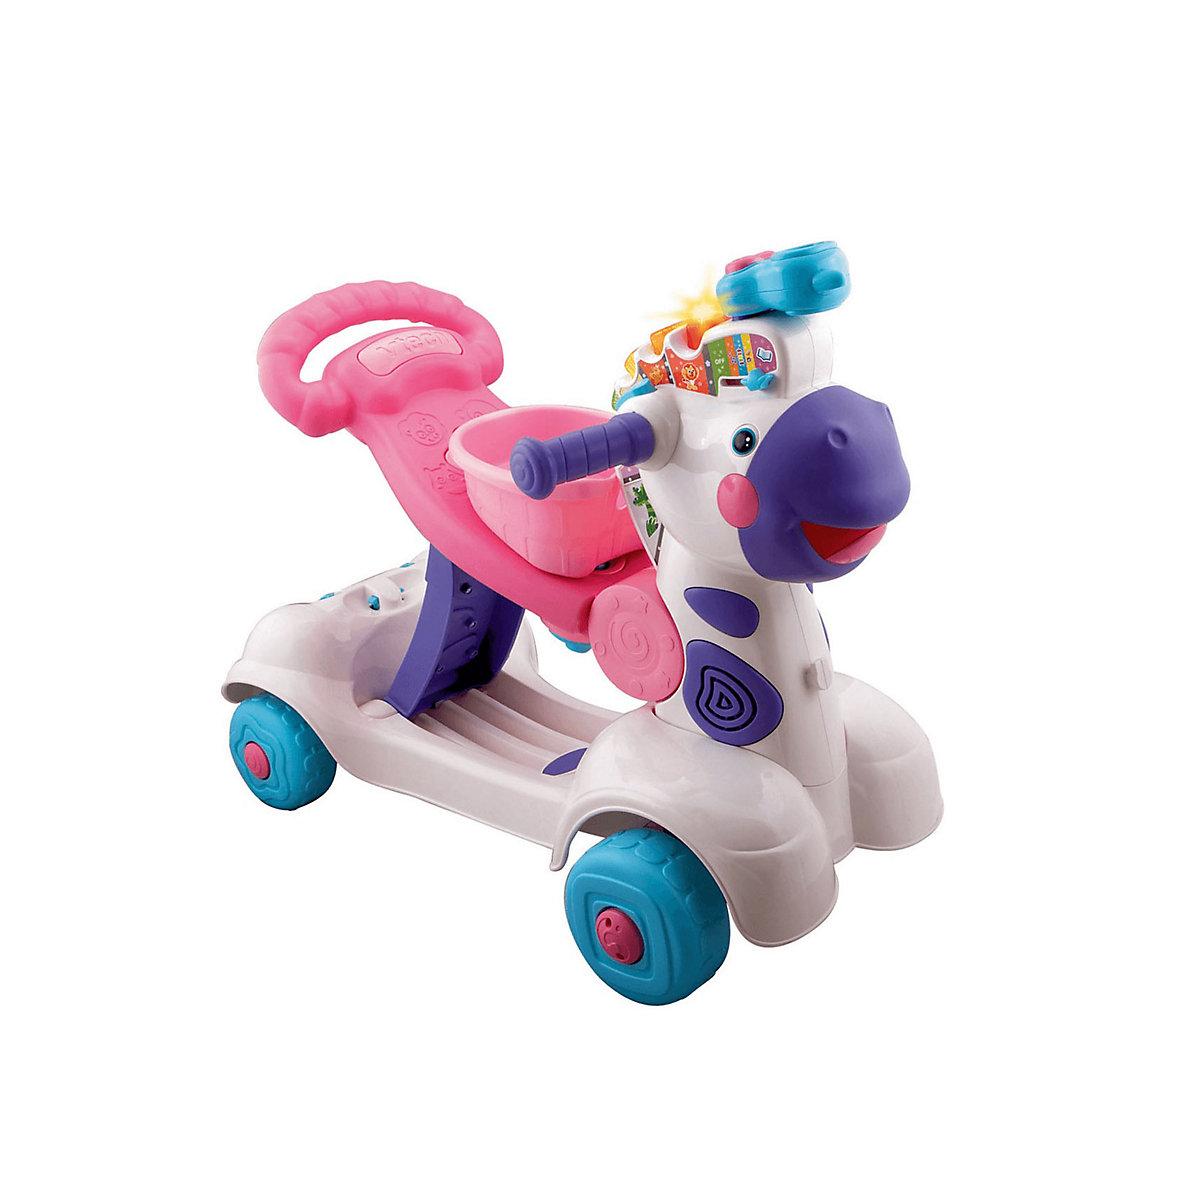 Vtech Zebra Scooter 3 In 1 Pink